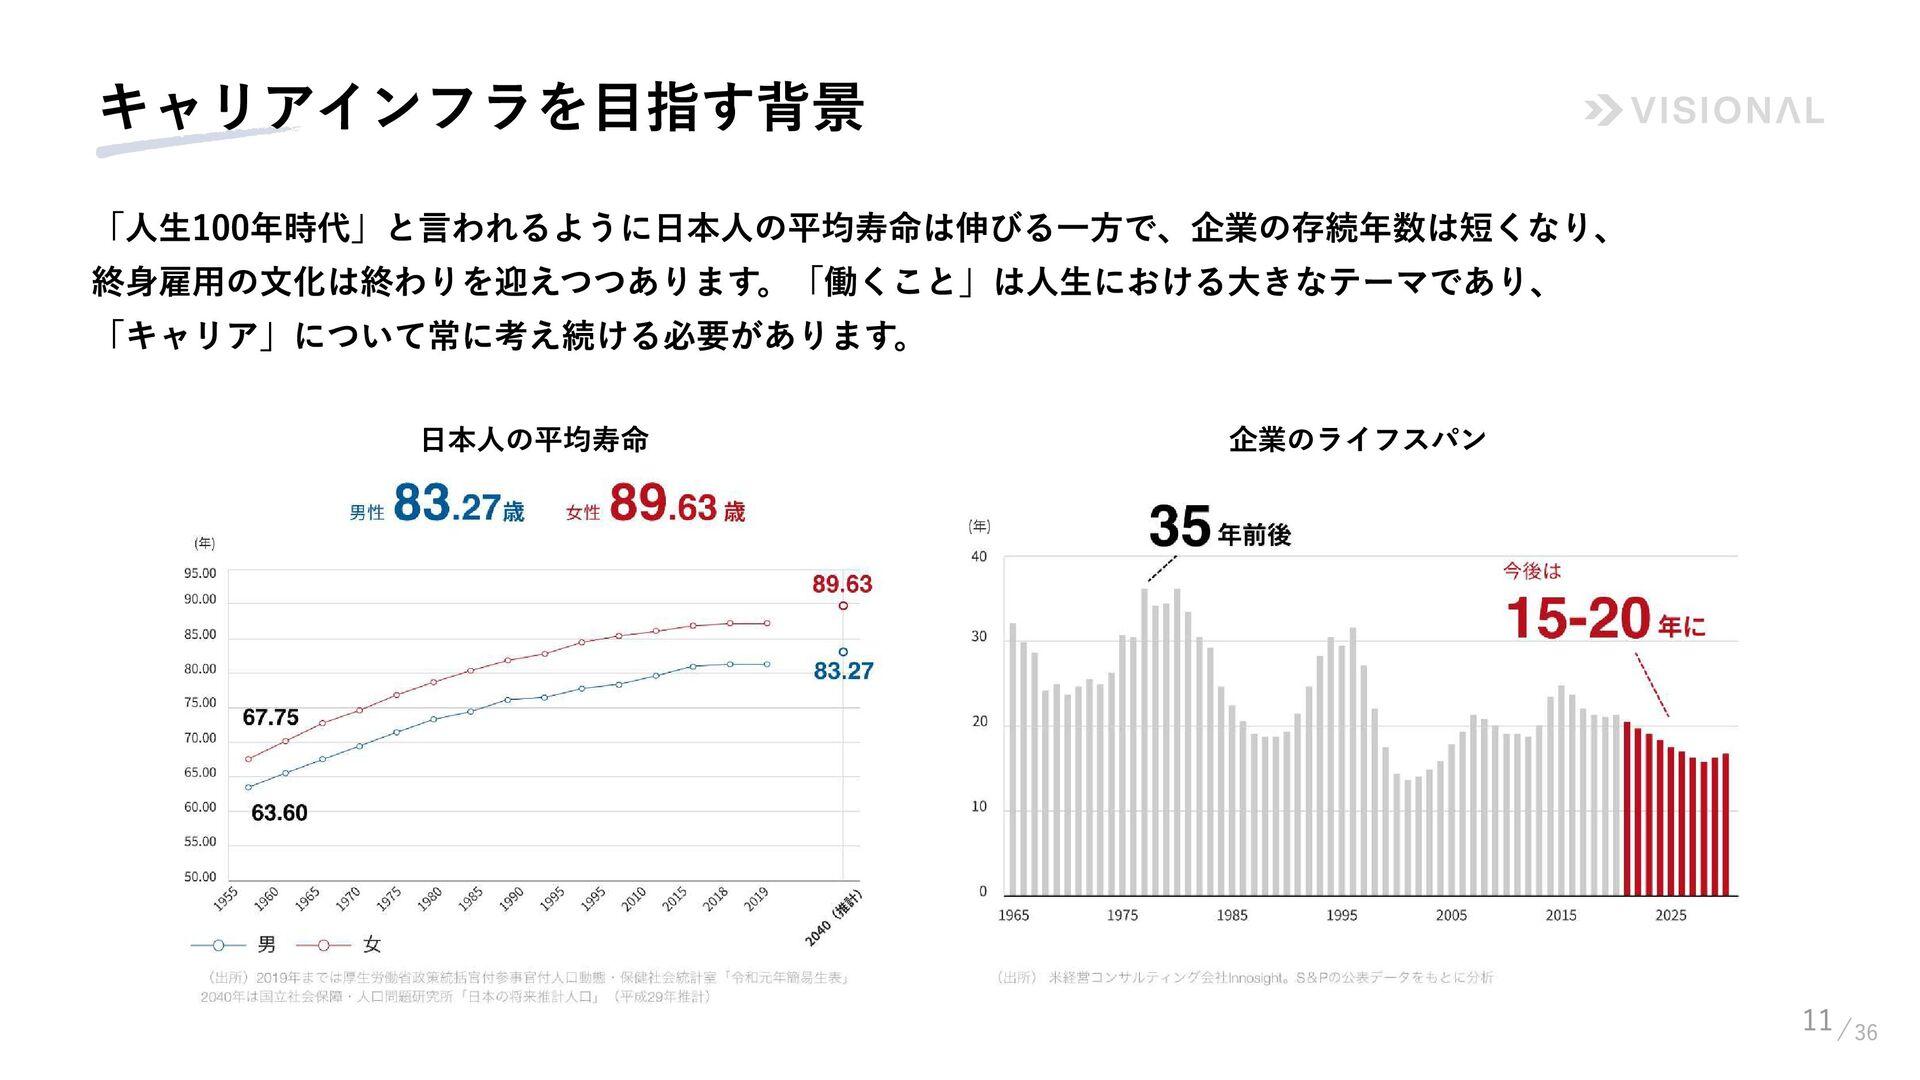 12 VISIONAL DESIGN Philosophy 15 VISIONAL DESI...